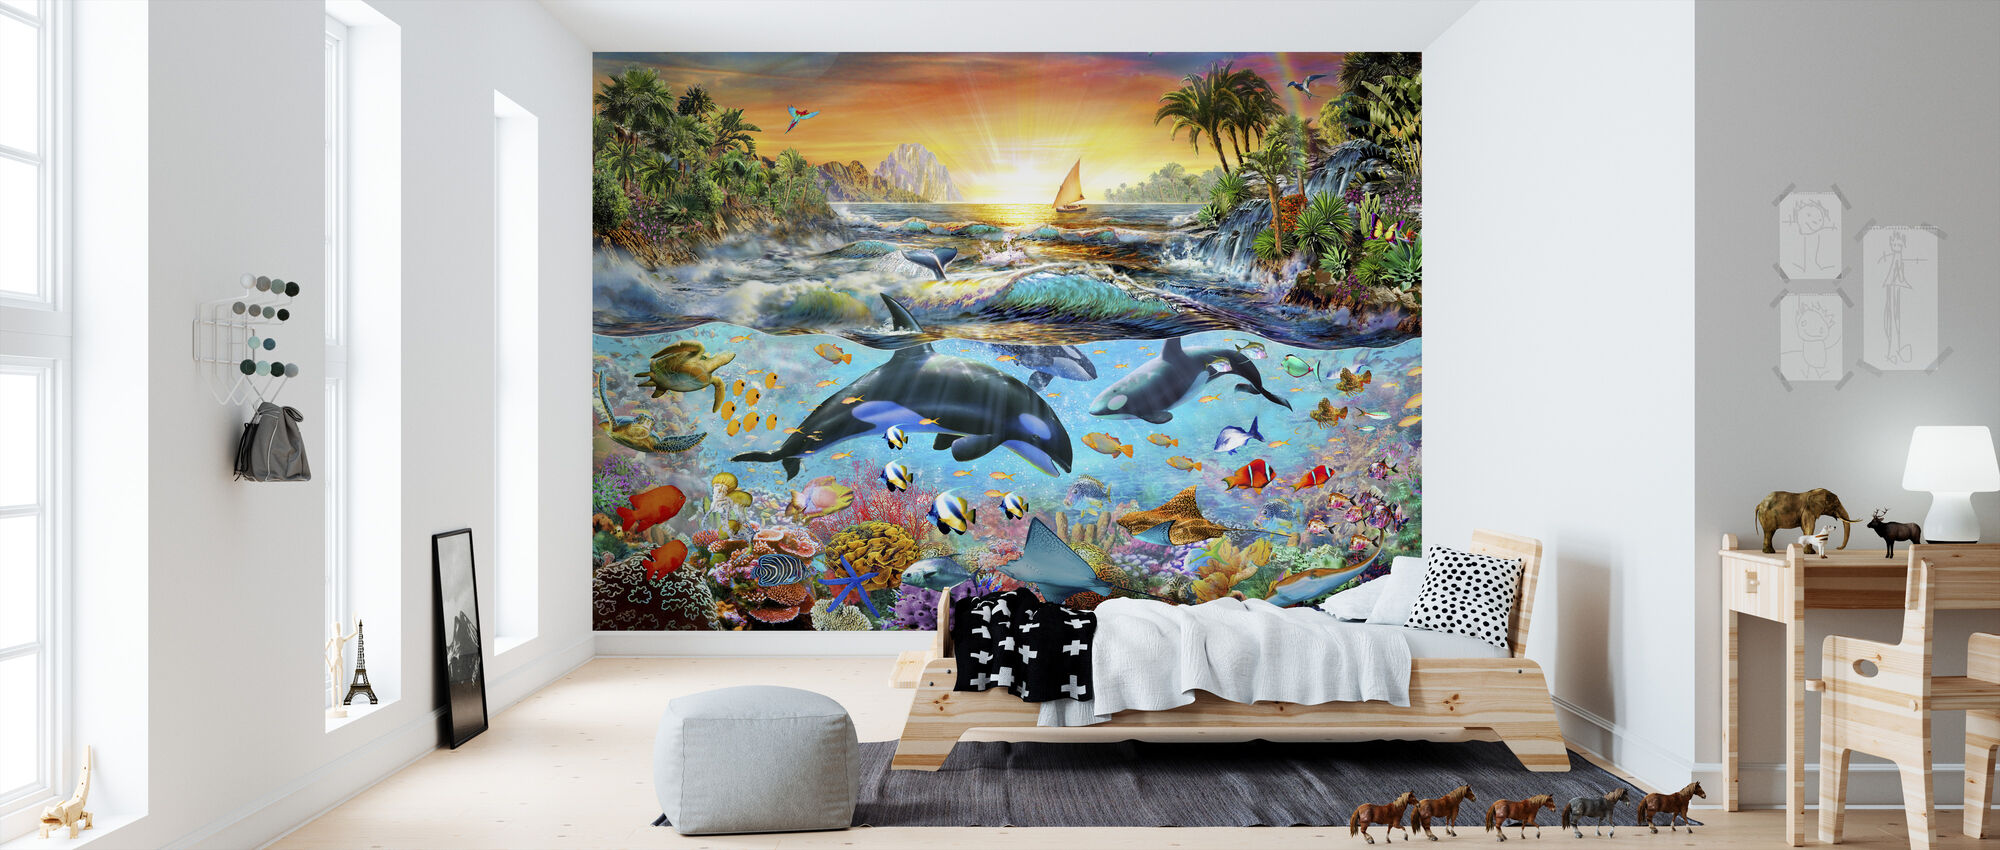 Orca Paradijs - Behang - Kinderkamer